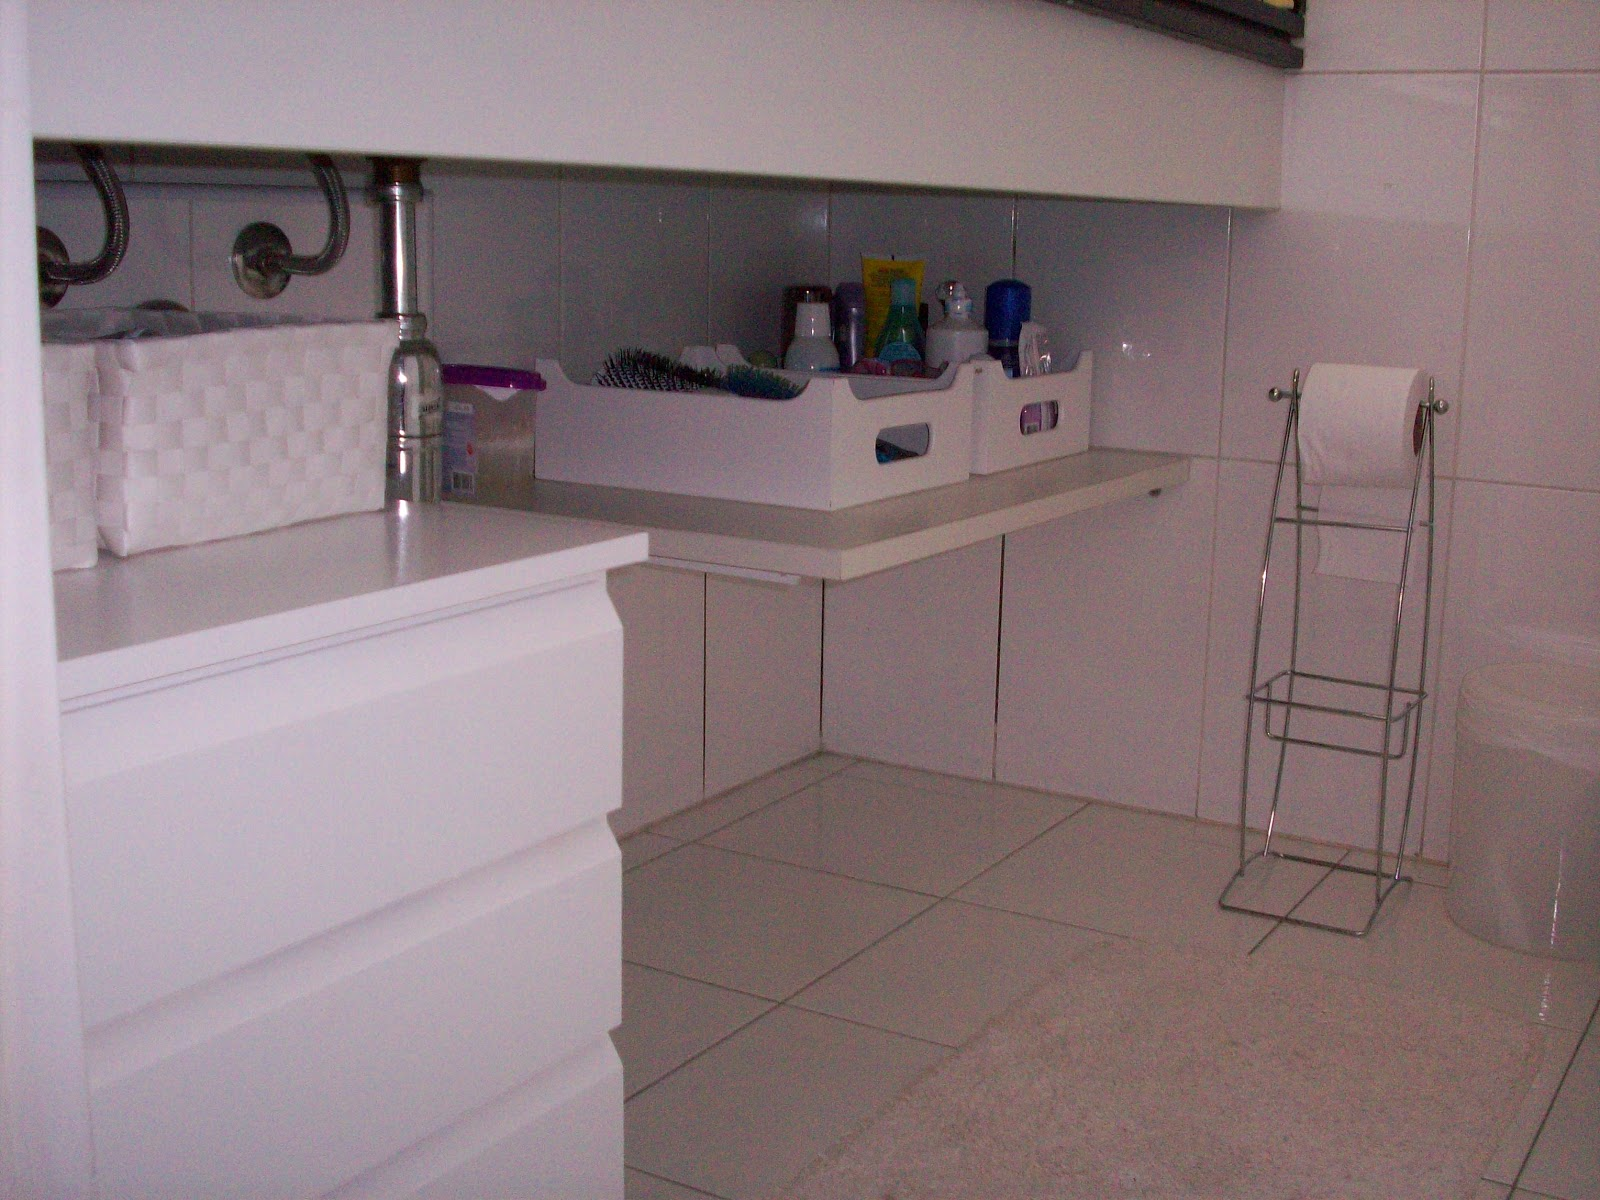 Imagens de #695951 Carla Romanelli: Quick Design Pinheiros 1600x1200 px 3146 Box Banheiro Acrilico Leroy Merlin